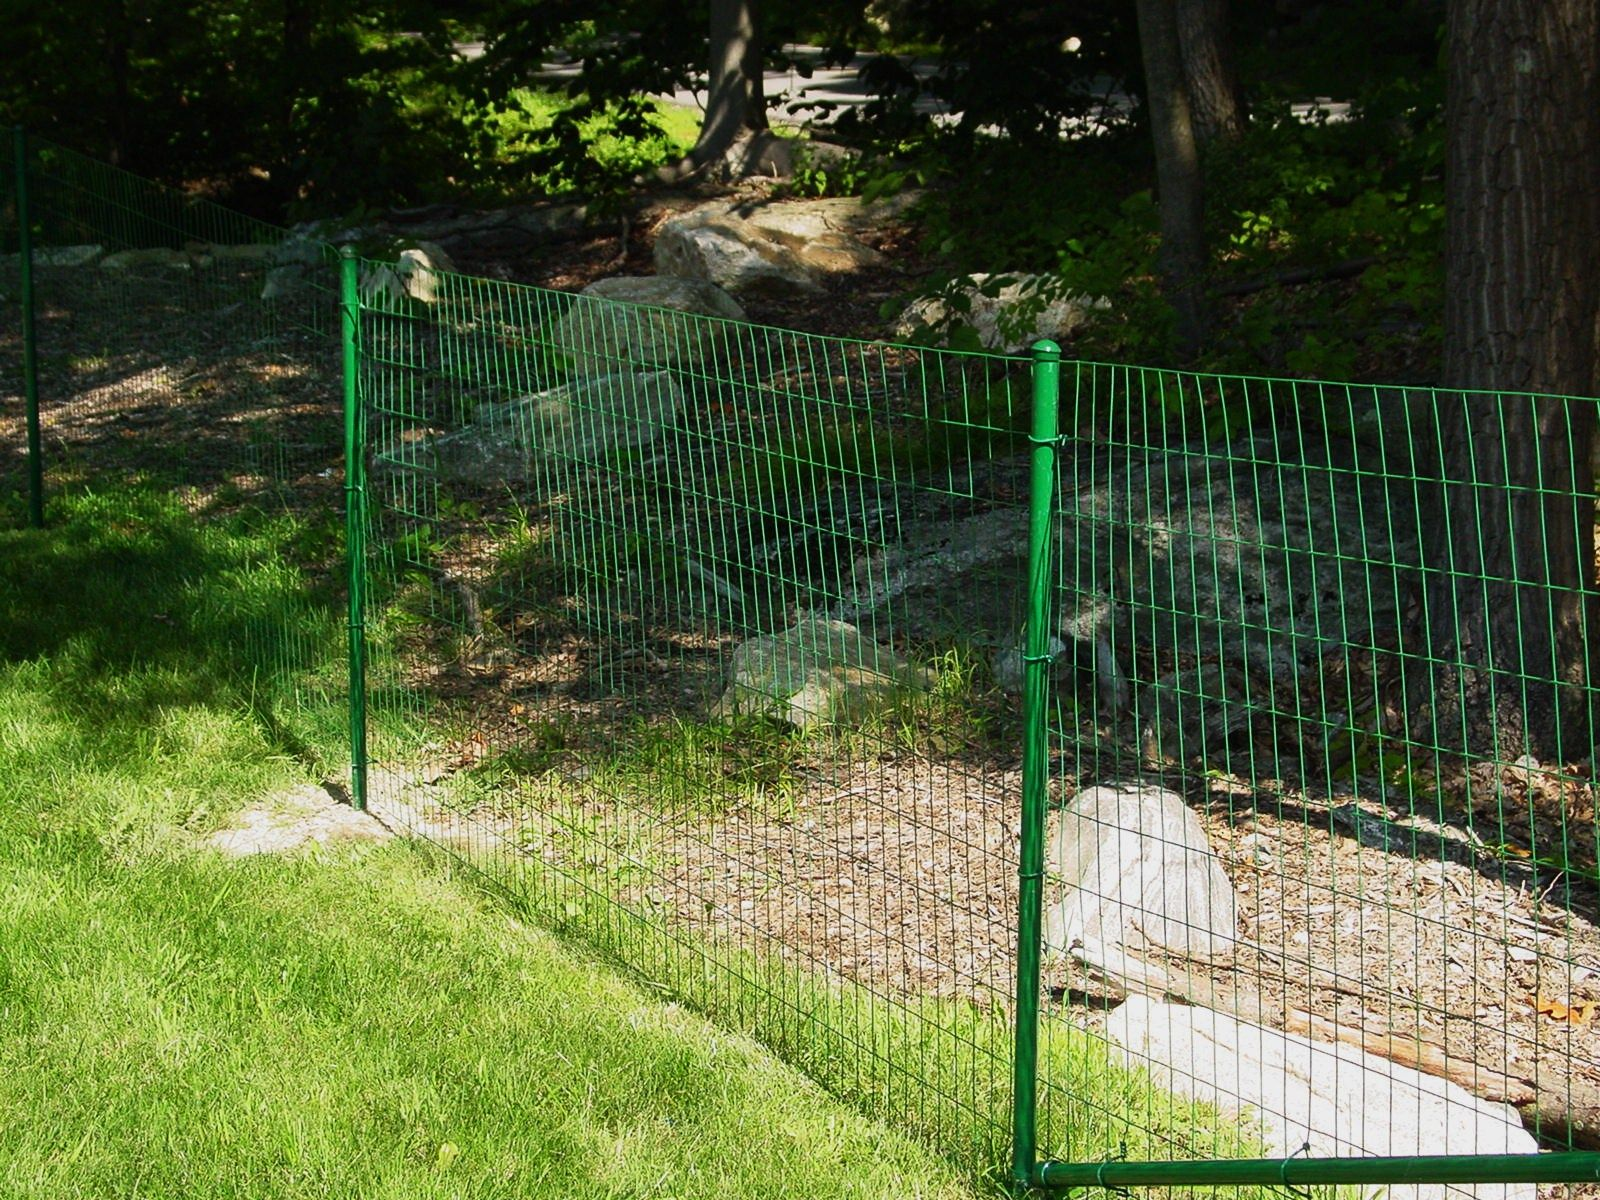 Farm Gate Plan Welded Wire Fencing 2x4 Google Search Fence Gate Design Backyard Fences Fence Gate